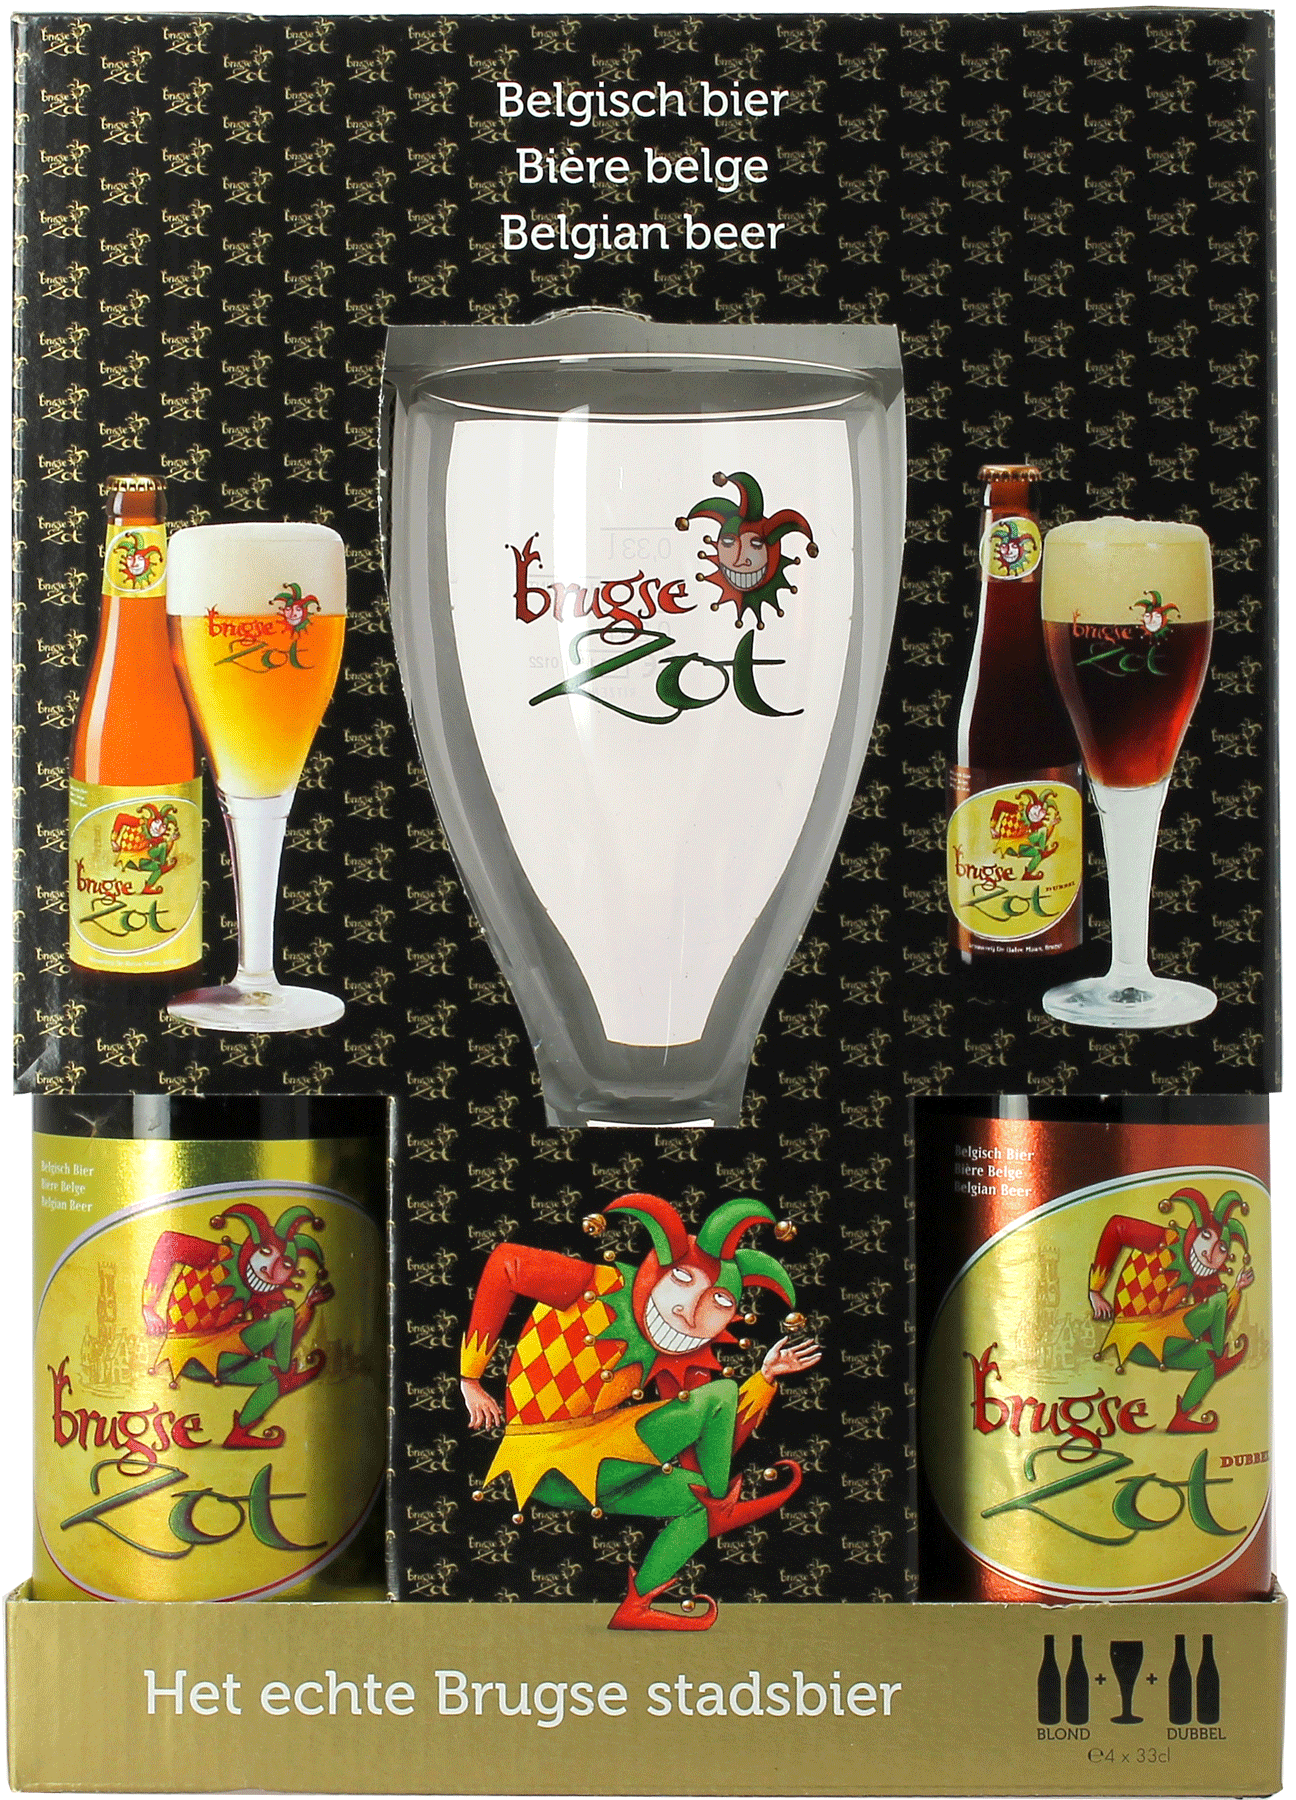 Bi/ère 1 verre Coffret Brugze zot 4 bieres